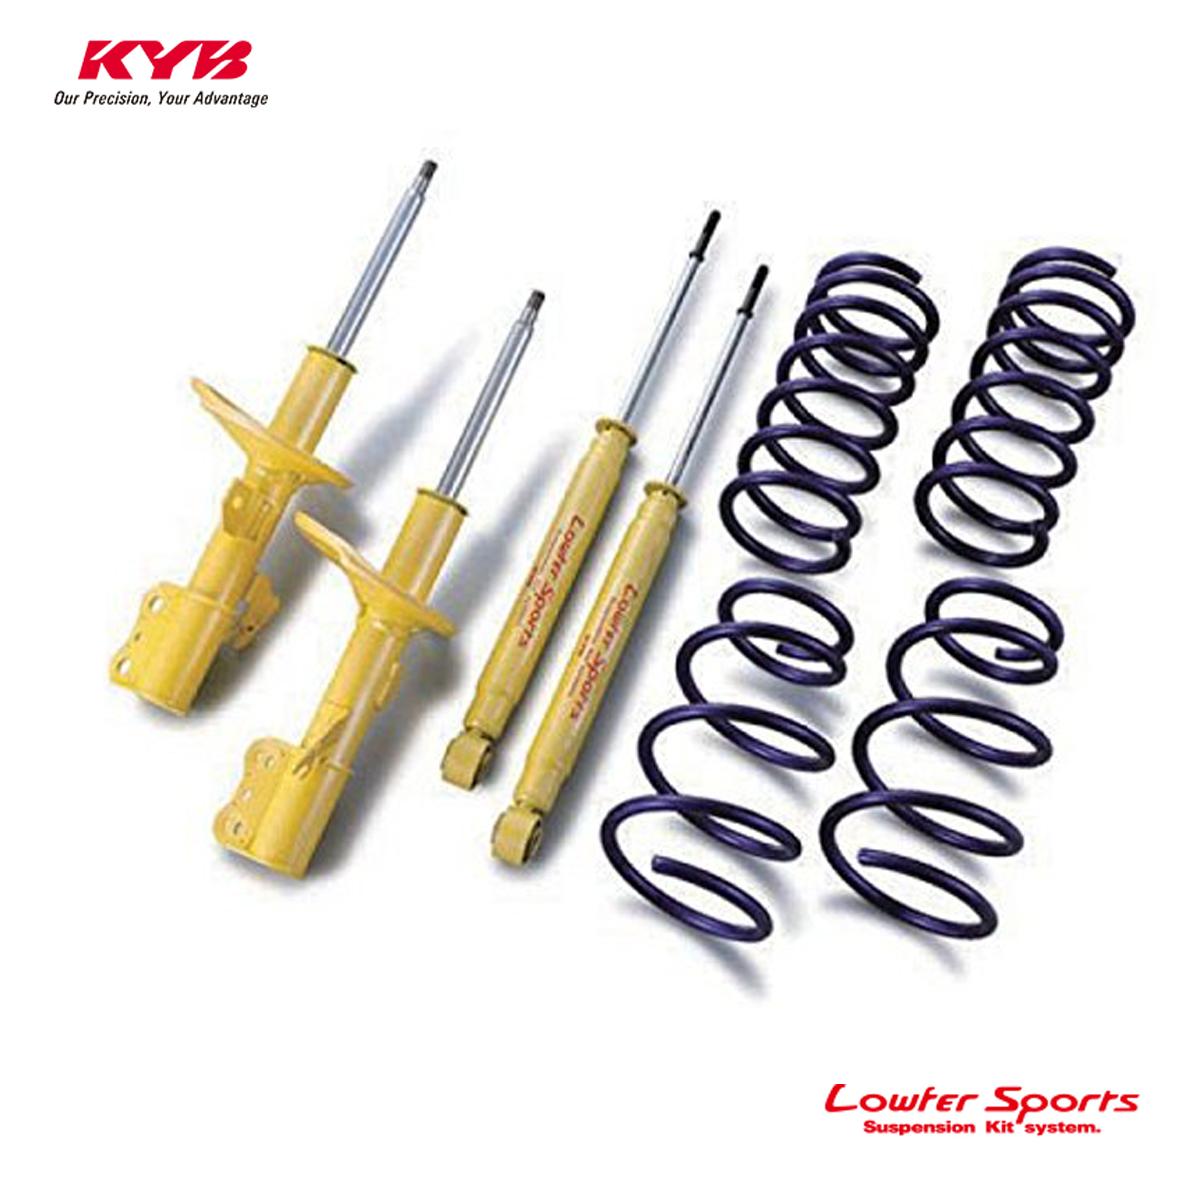 KYB カヤバ ムーヴ L602S ショックアブソーバー サスペンションキット Lowfer Sports LKIT-L602S 配送先条件有り